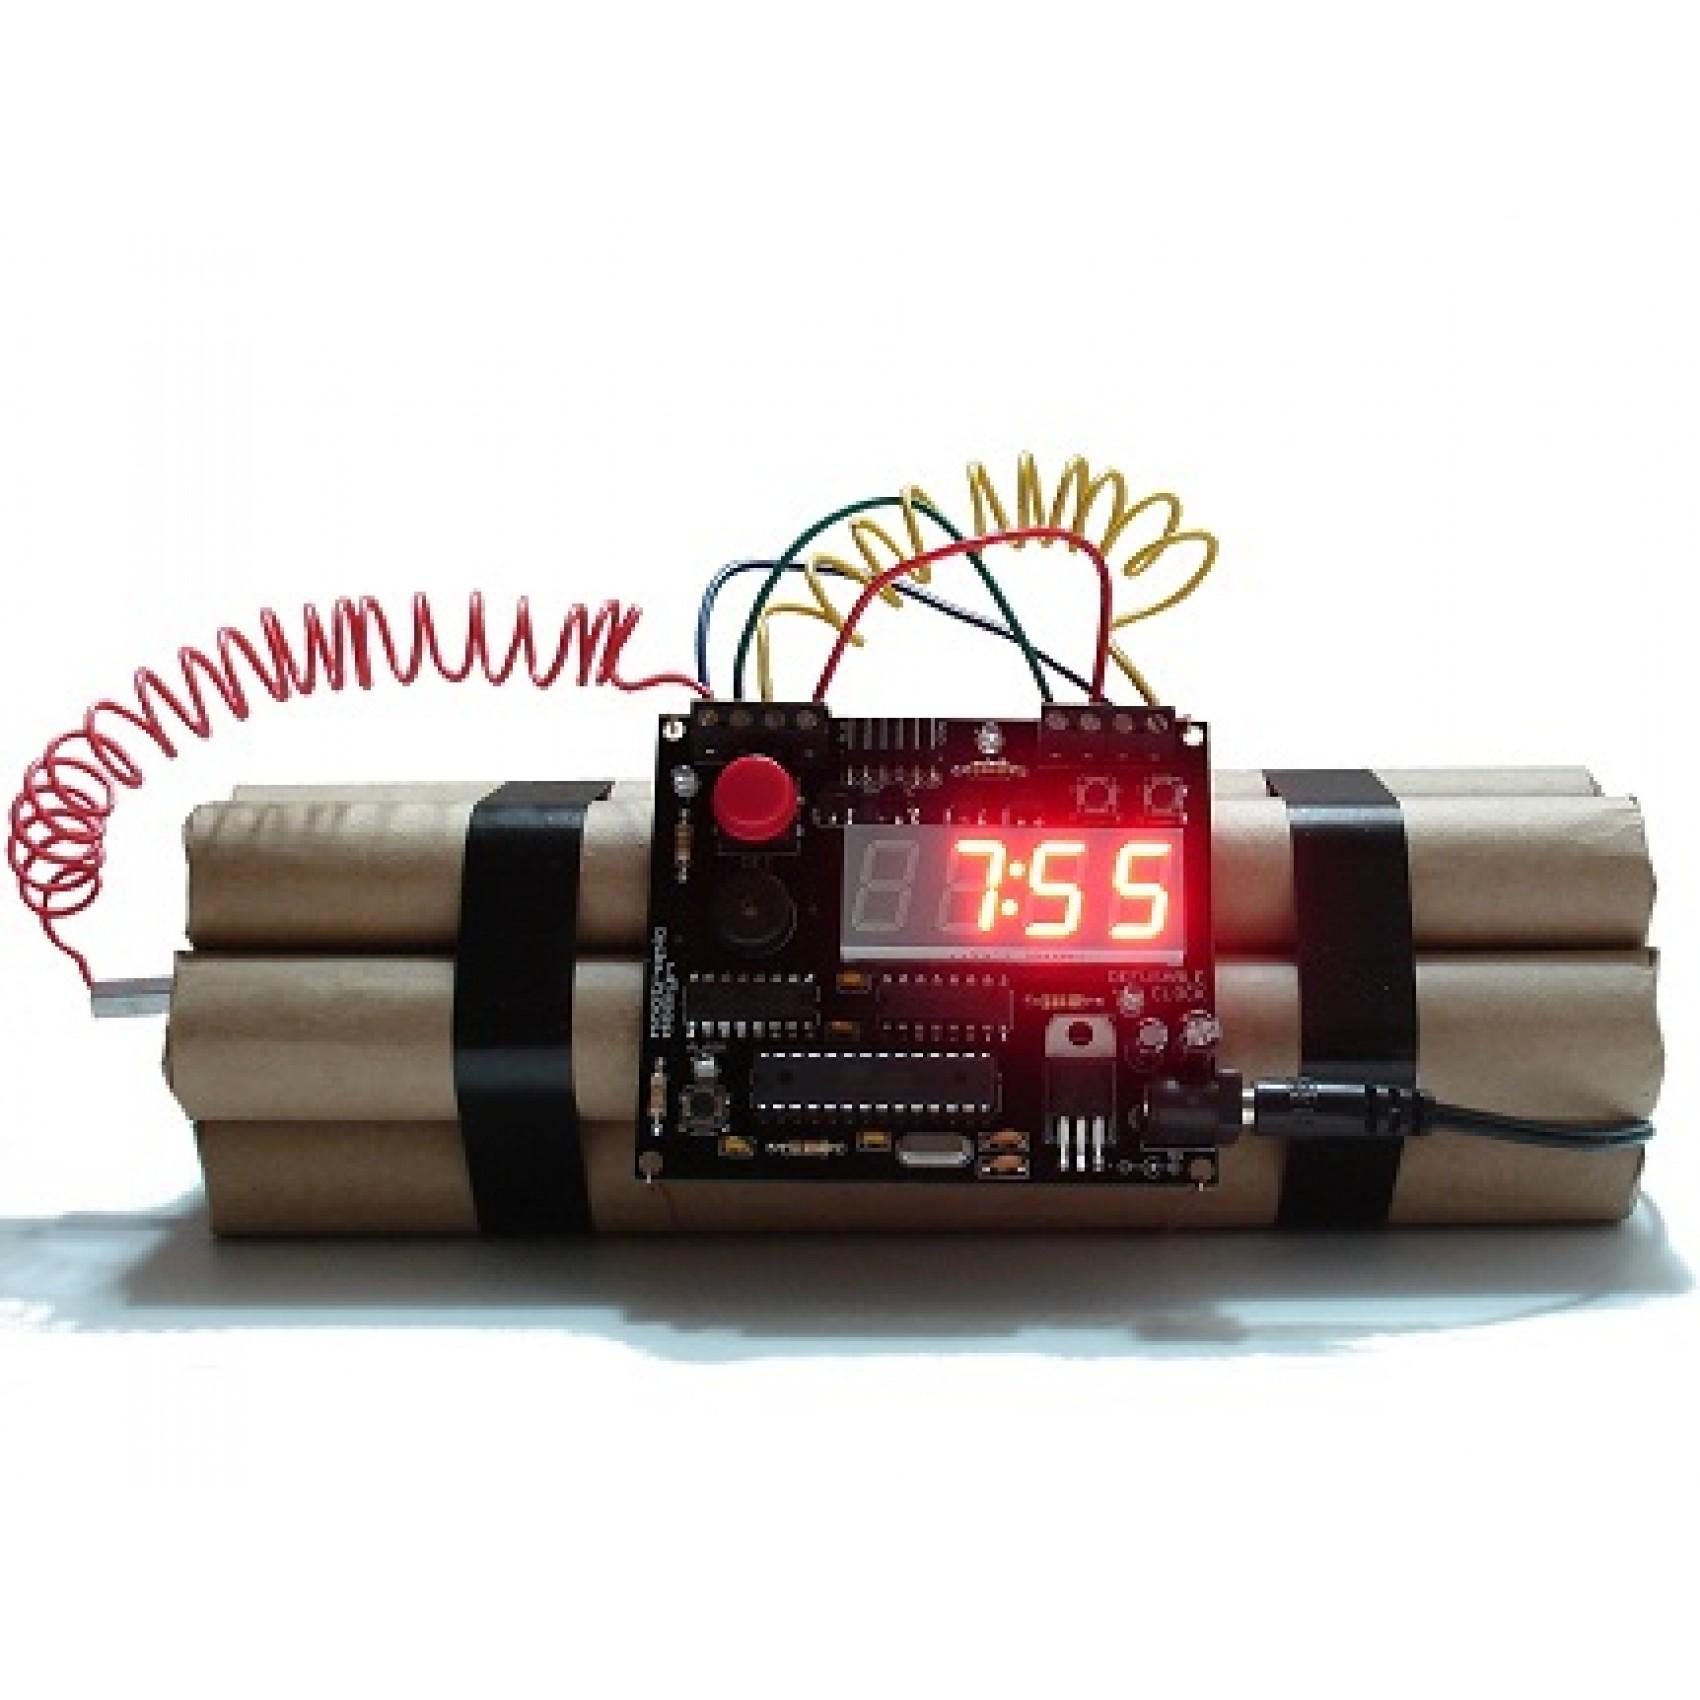 שעון מעורר פצצה דינמיט